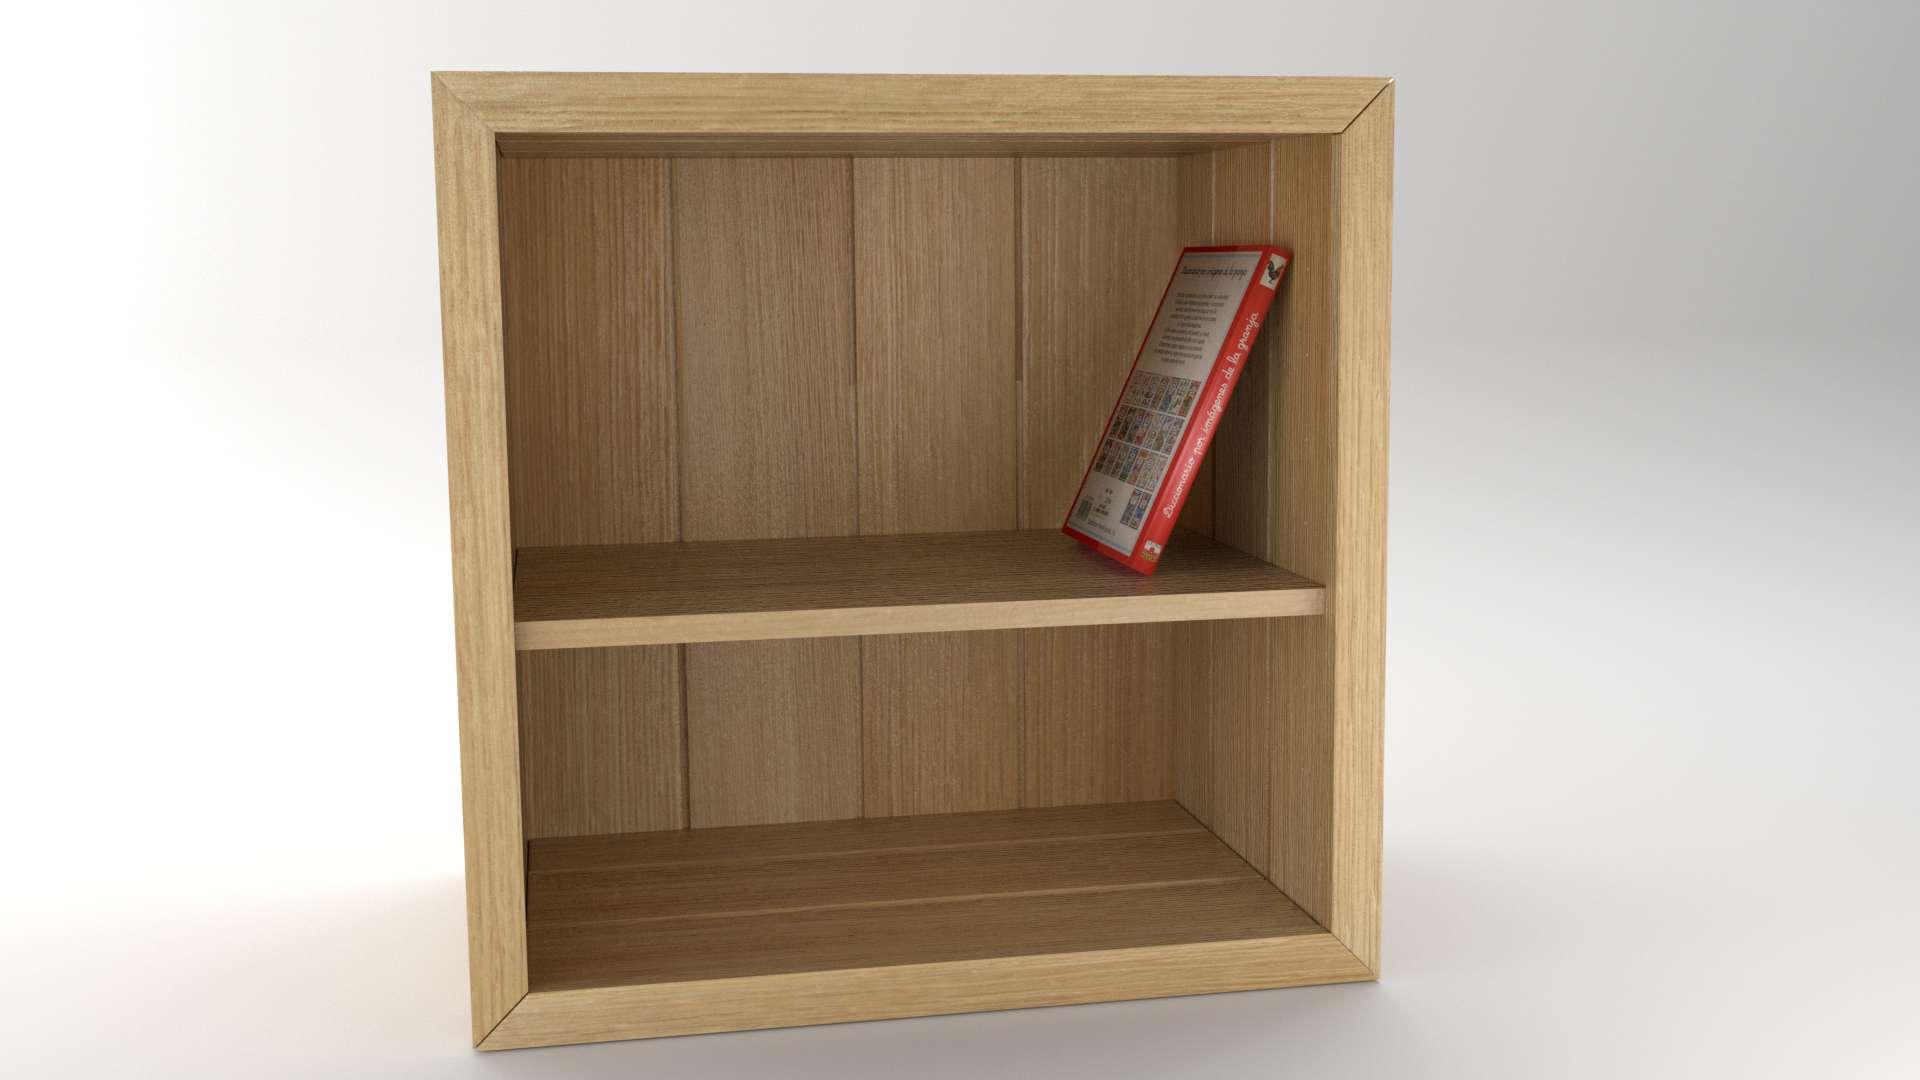 Model Crusoe CabinetShelf Vista 1